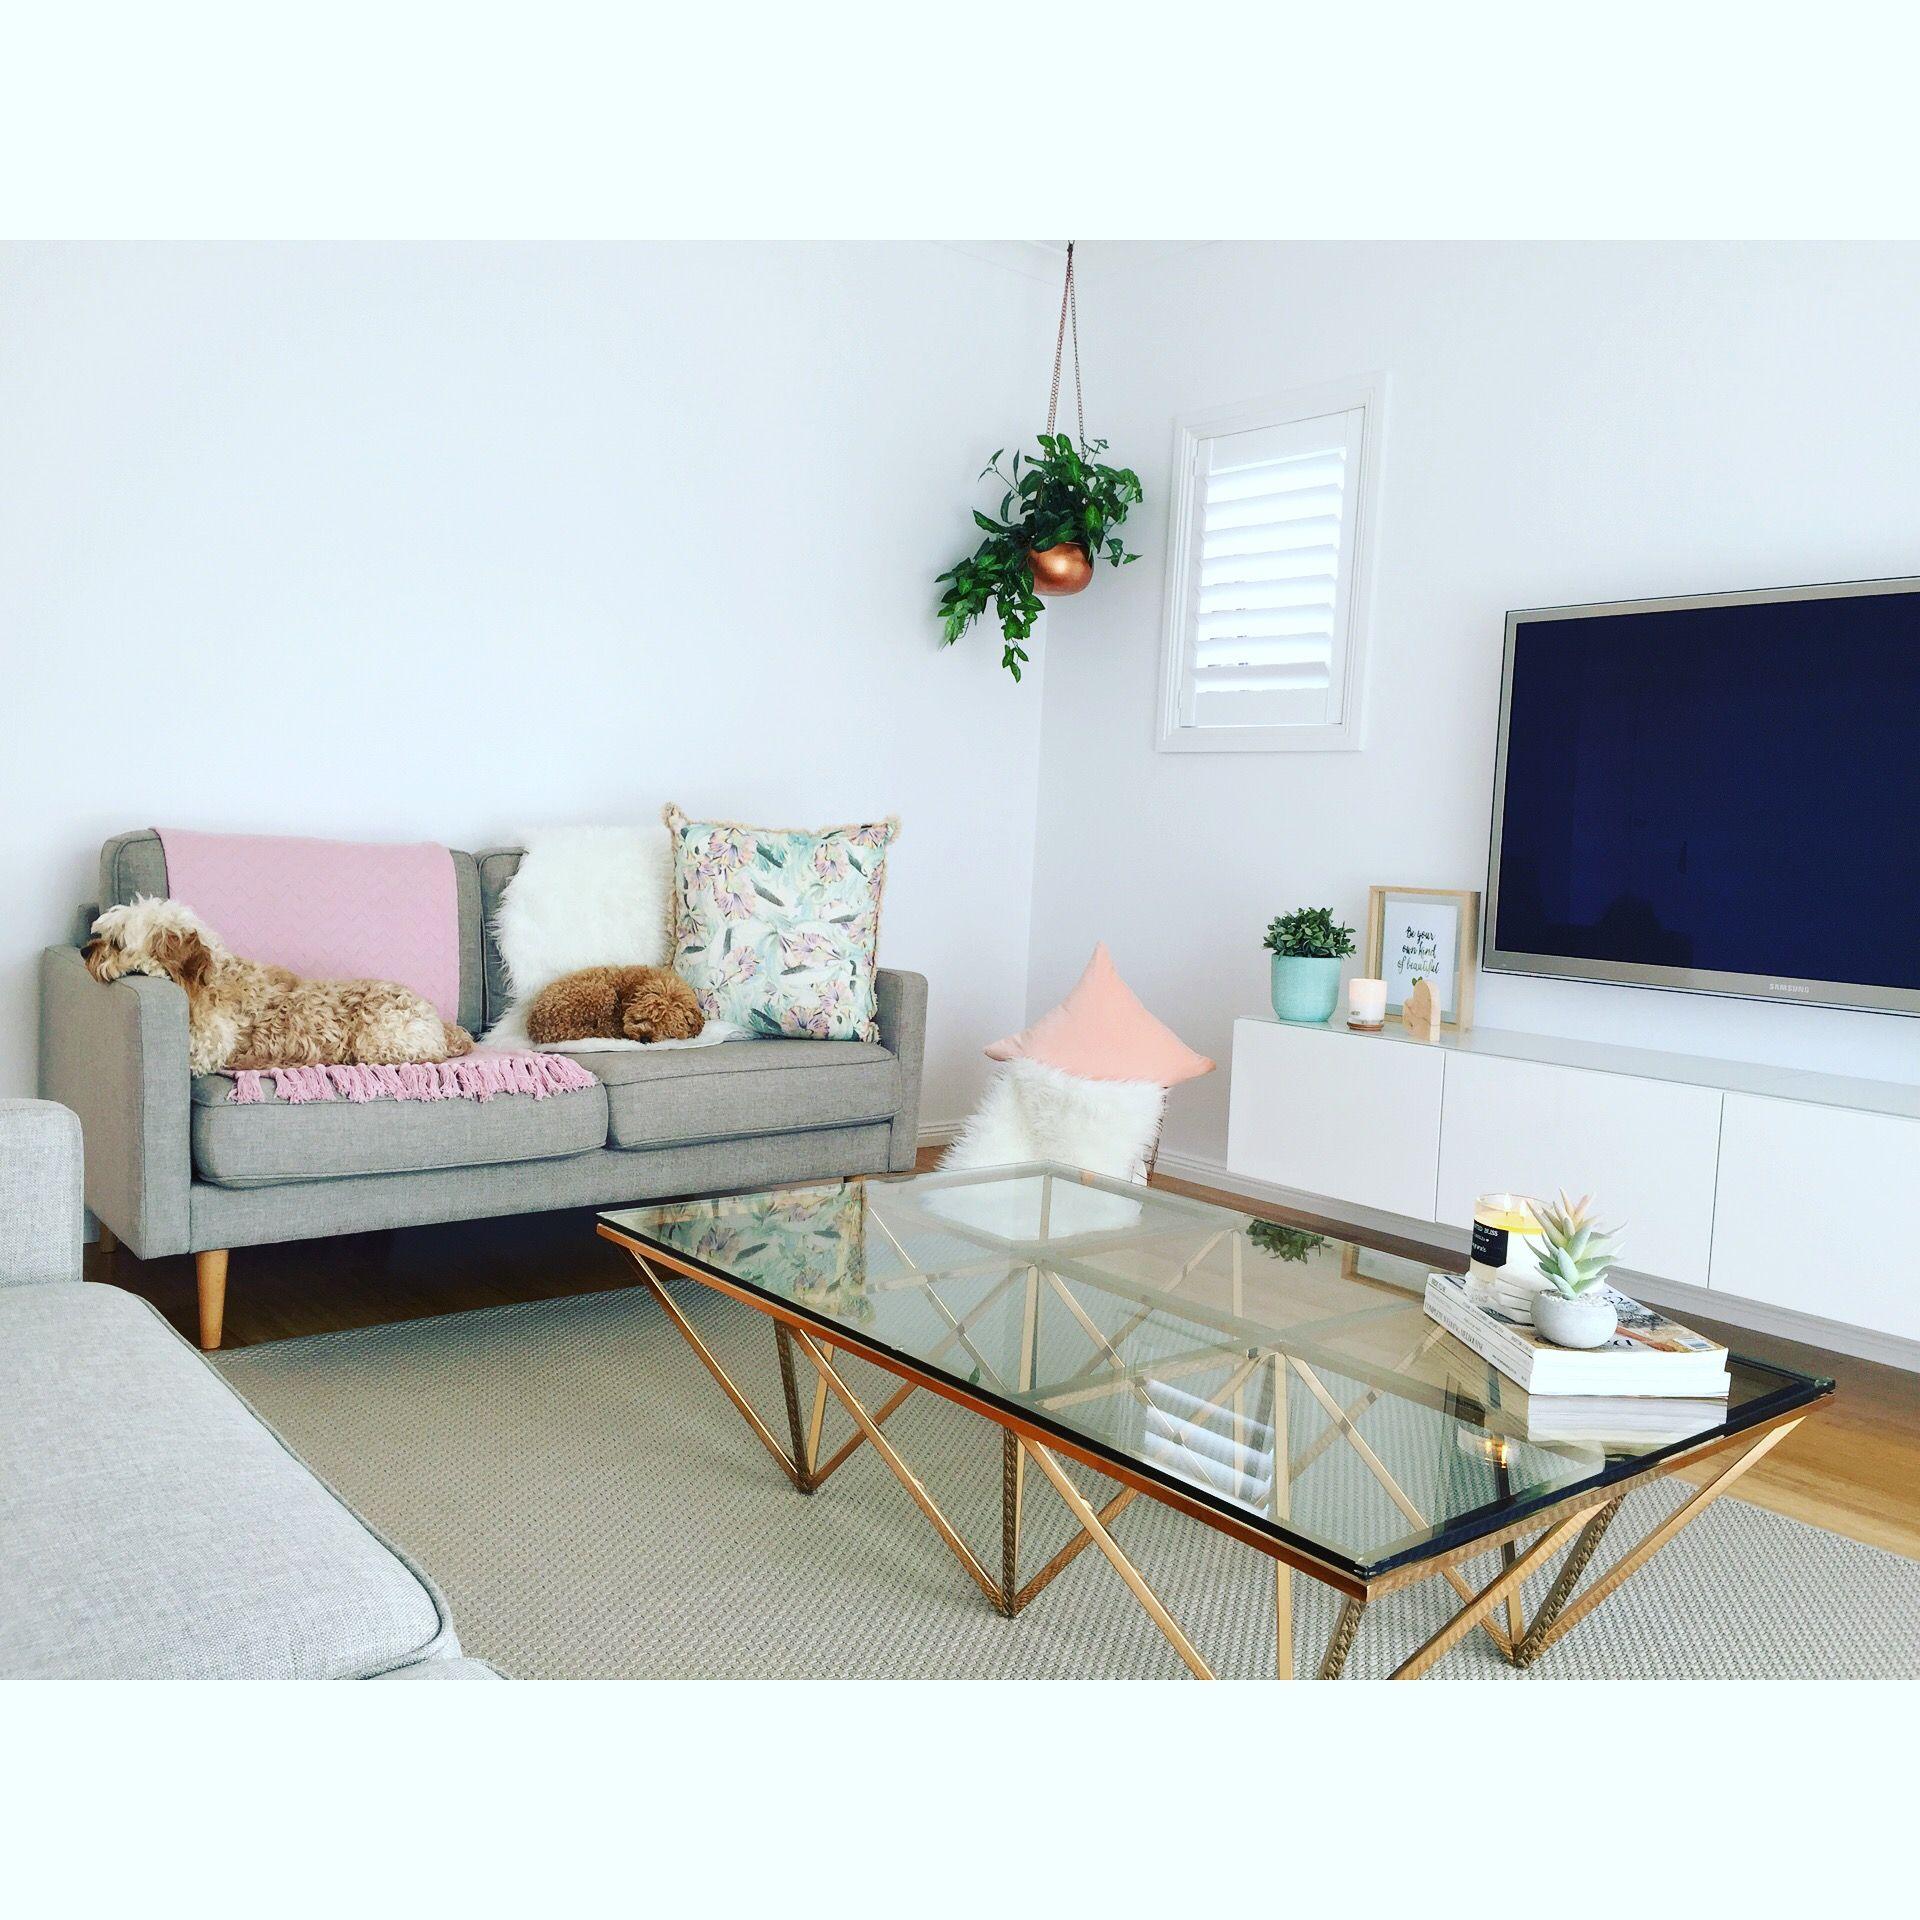 Scandi Love Scandinavian Decor Copper Coffee Table White Gloss Floating Tv Unit My Style Pastel Colours Hanging Mi Scandinavian Decor Tv Unit Decor Decor